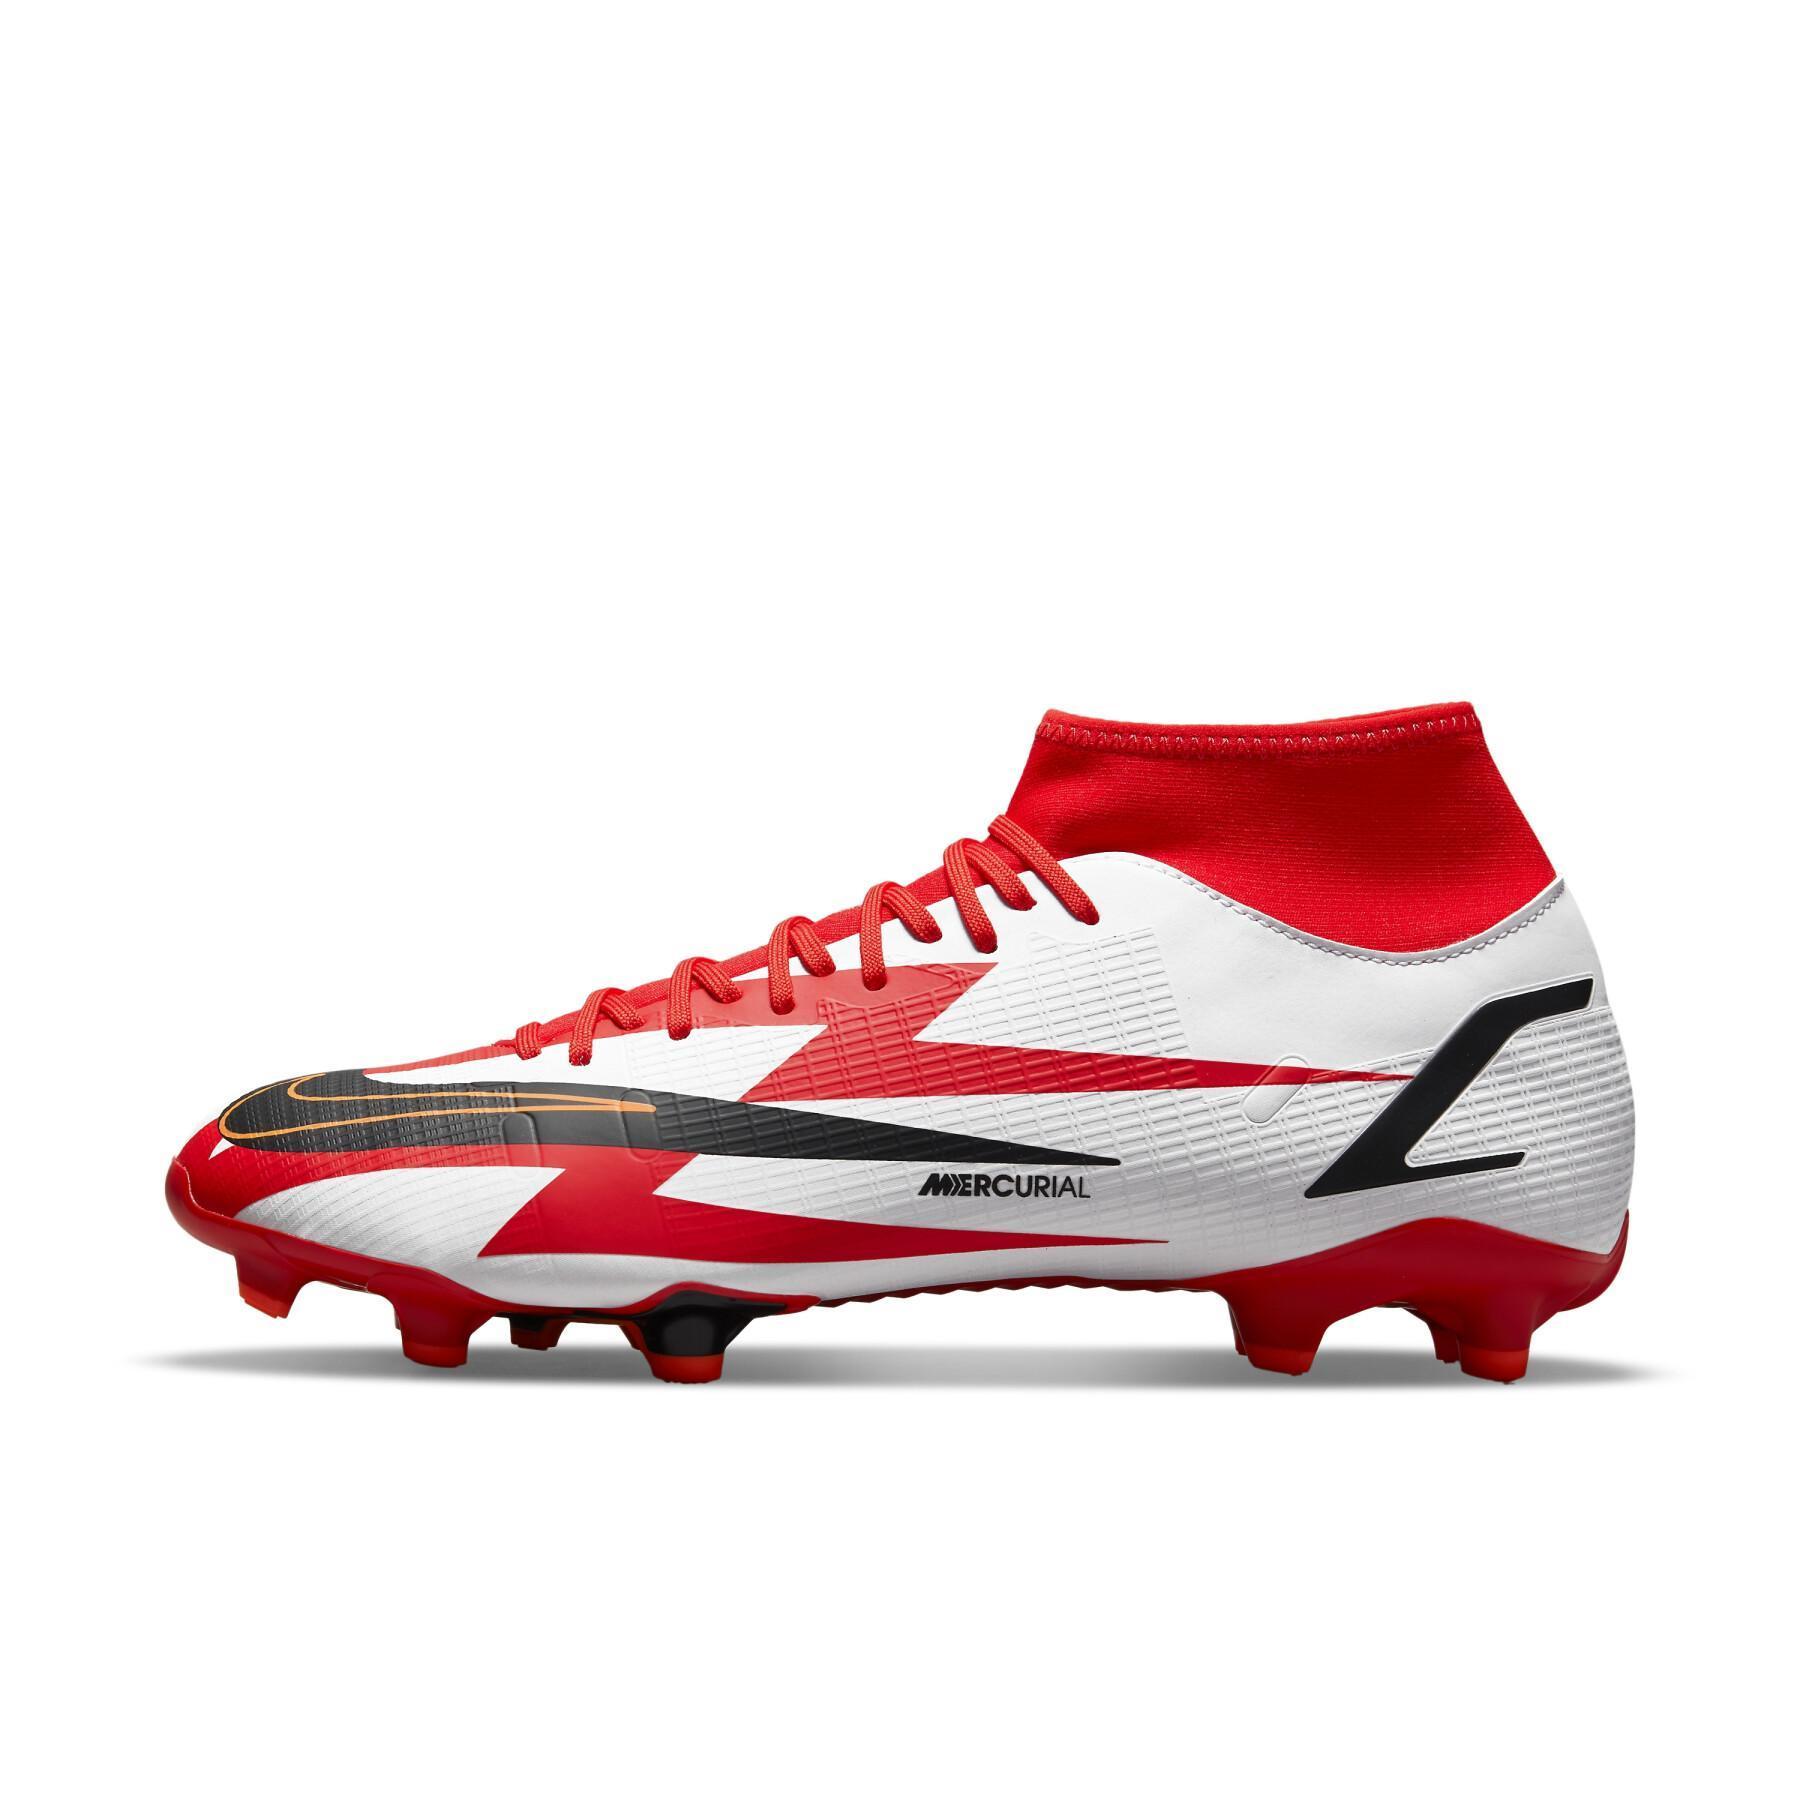 Zapatos Nike Mercurial Superfly 8 Academy CR7 MG